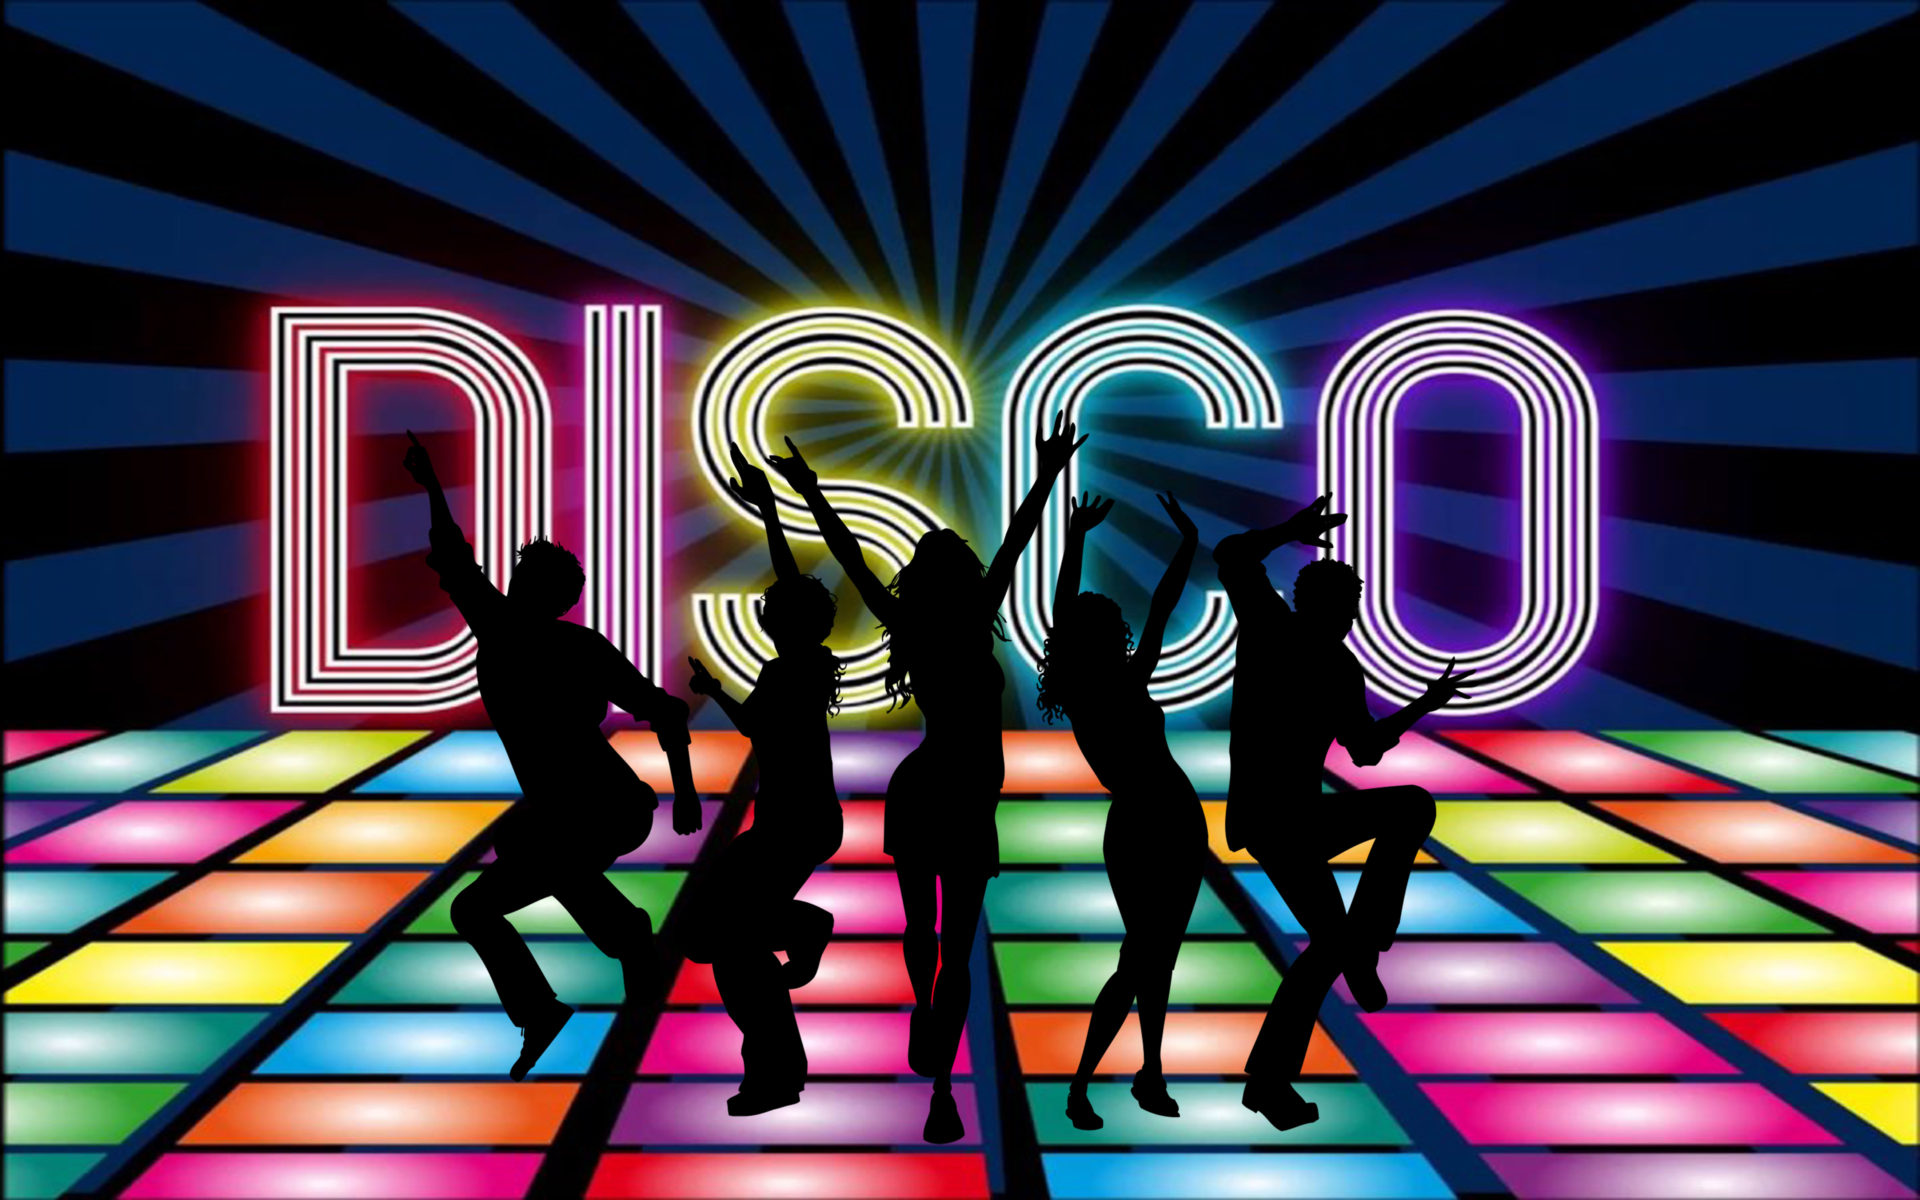 Photo Dj Girl Wallpaper Disco Disco Music Disko Dancing 4k Ultra Hd Wallpaper For